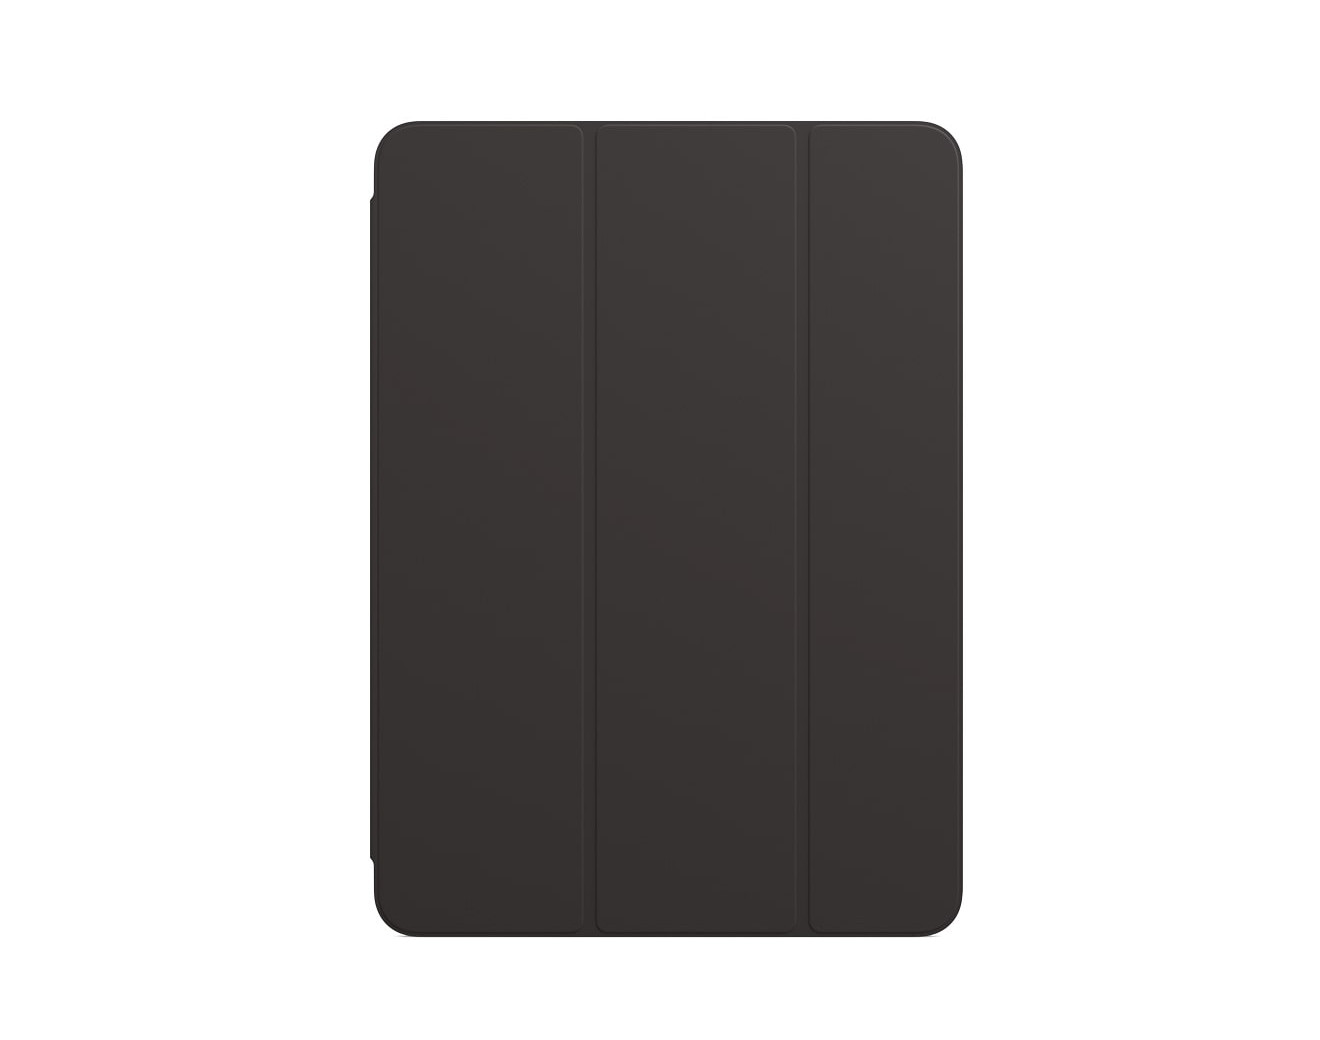 Apple Smart Folio 10.9-inch iPad Air 4 (2020), Black